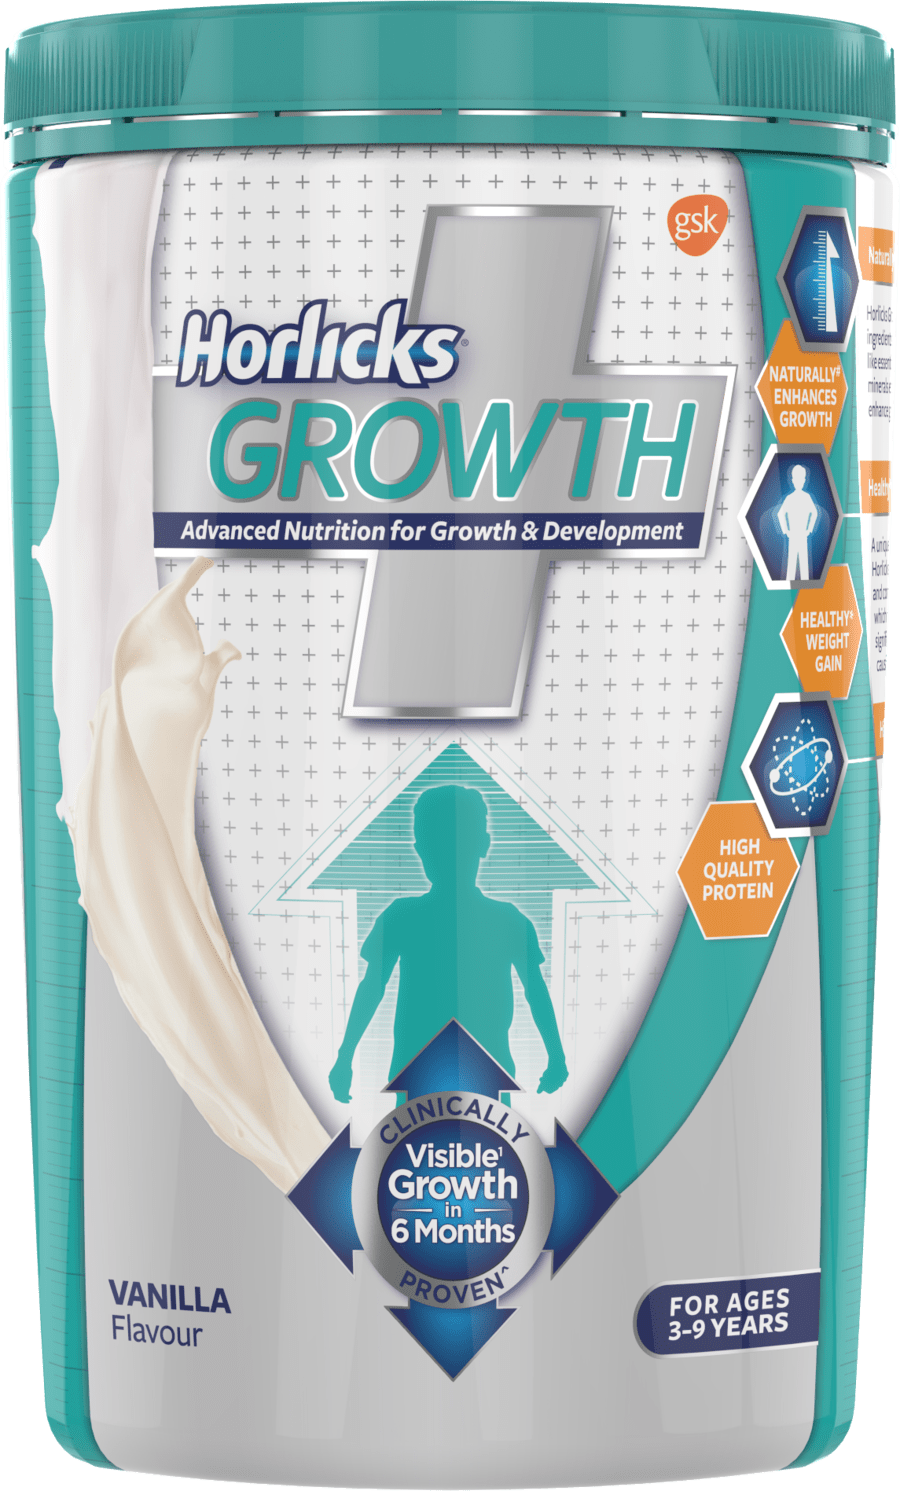 Horlicks Growth Plus – Health & Nutrition Drink 400gm Pet Jar